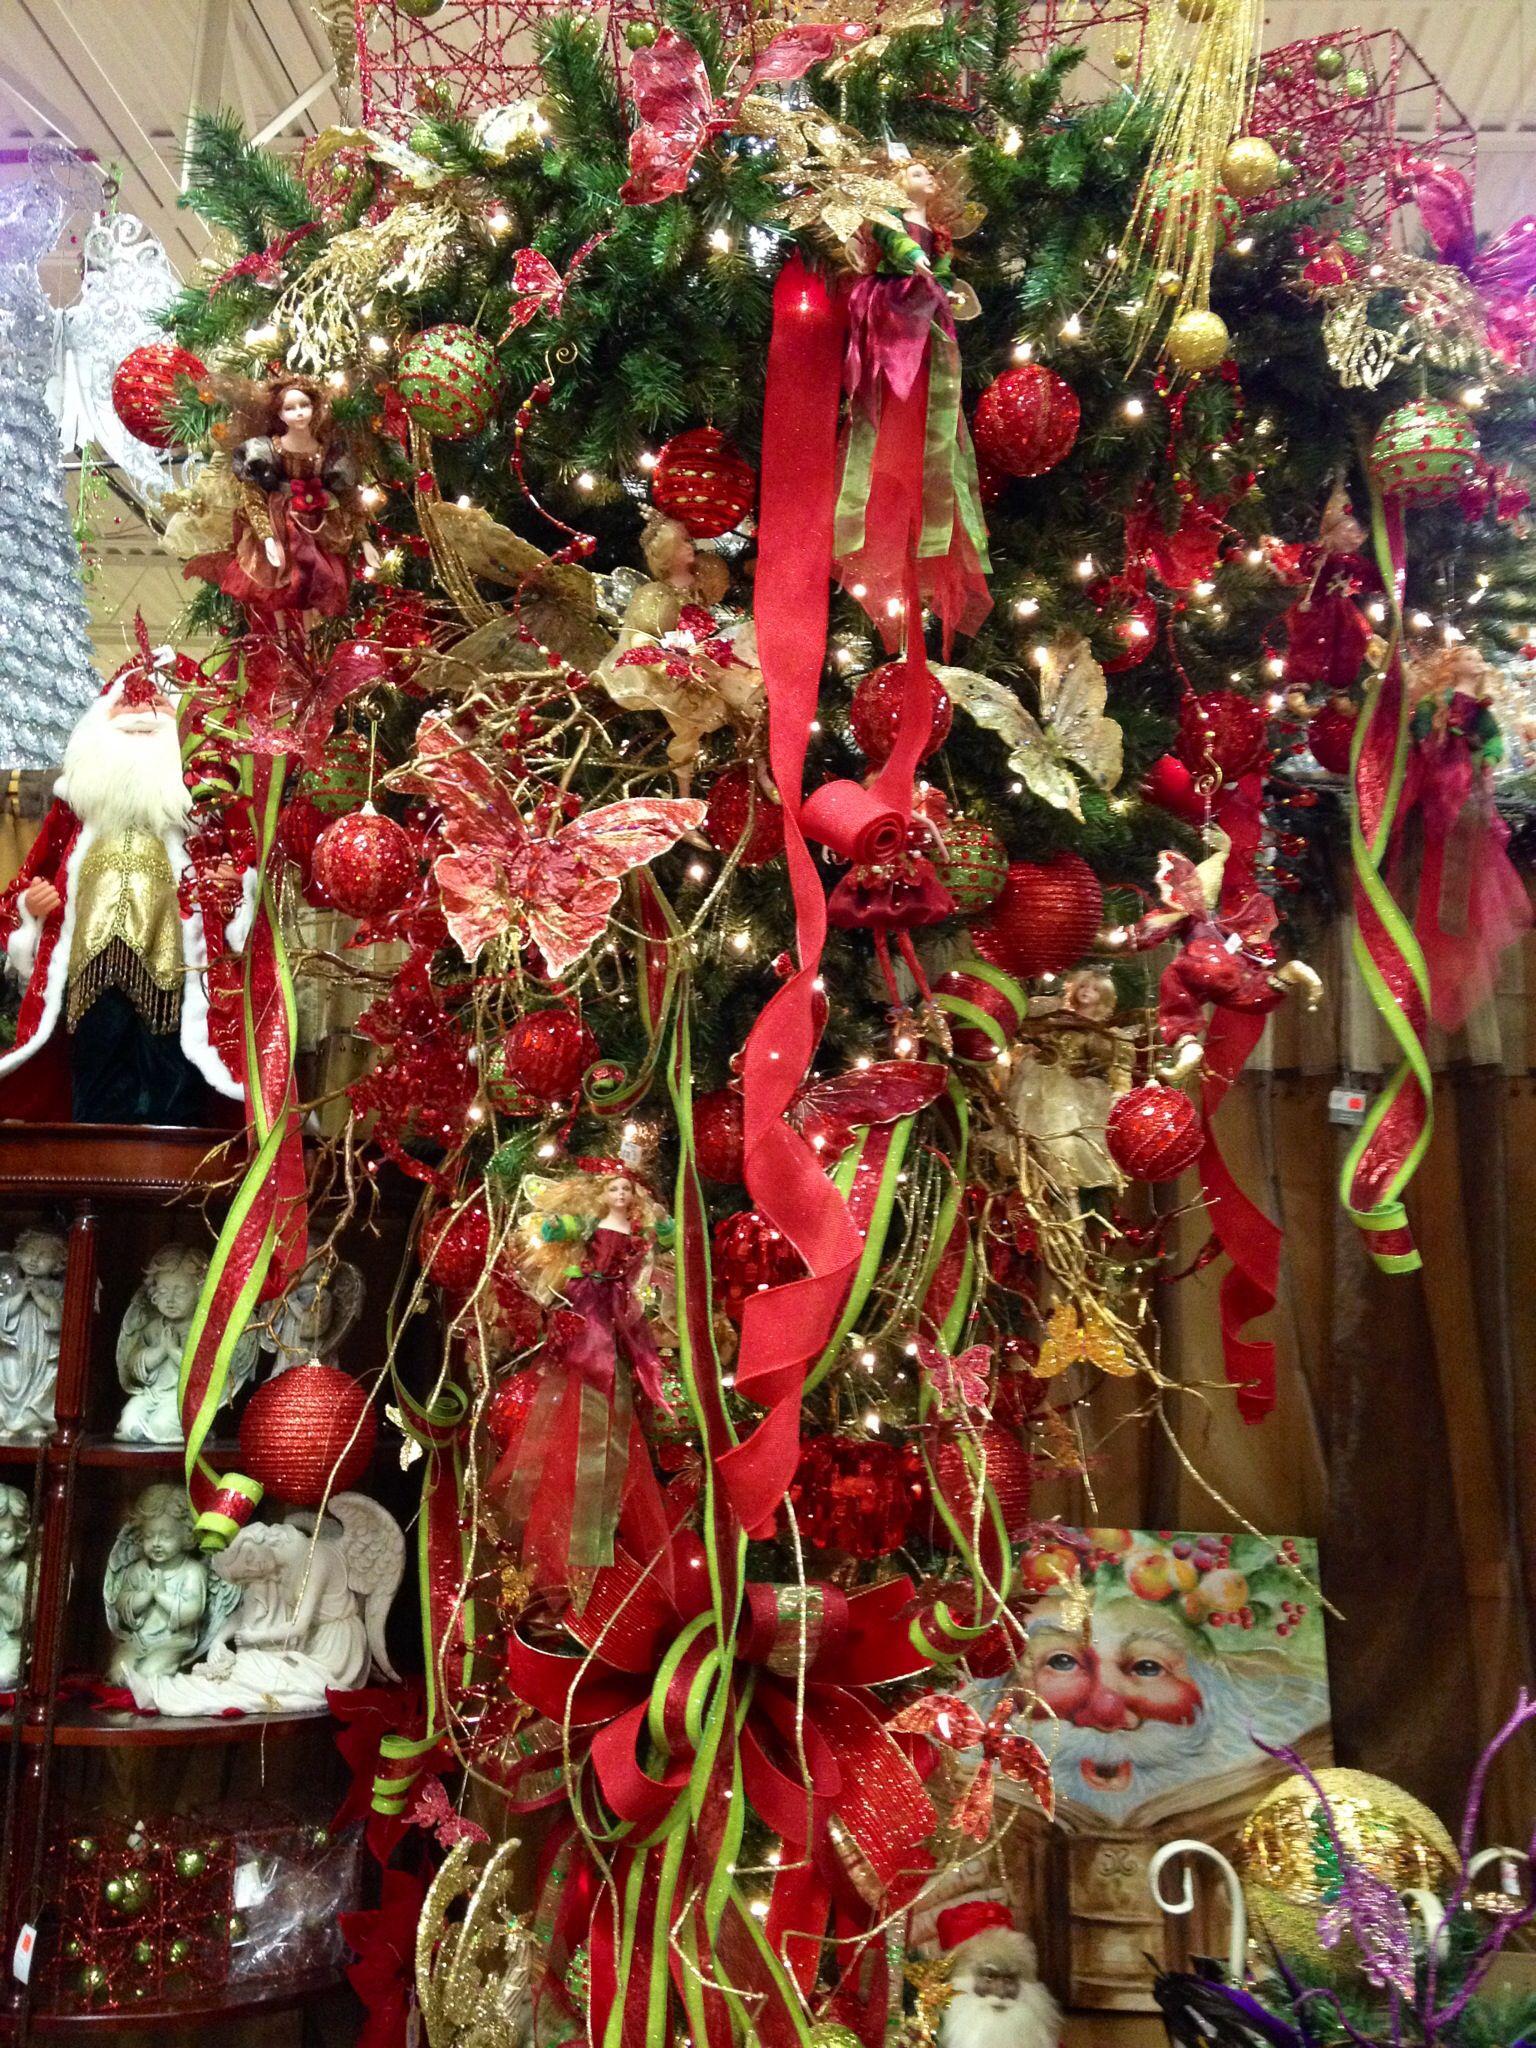 Pin By Arcadia Floral And Home Decor On Christmas At Arcadia Upside Down Christmas Tree Holiday Tree Christmas